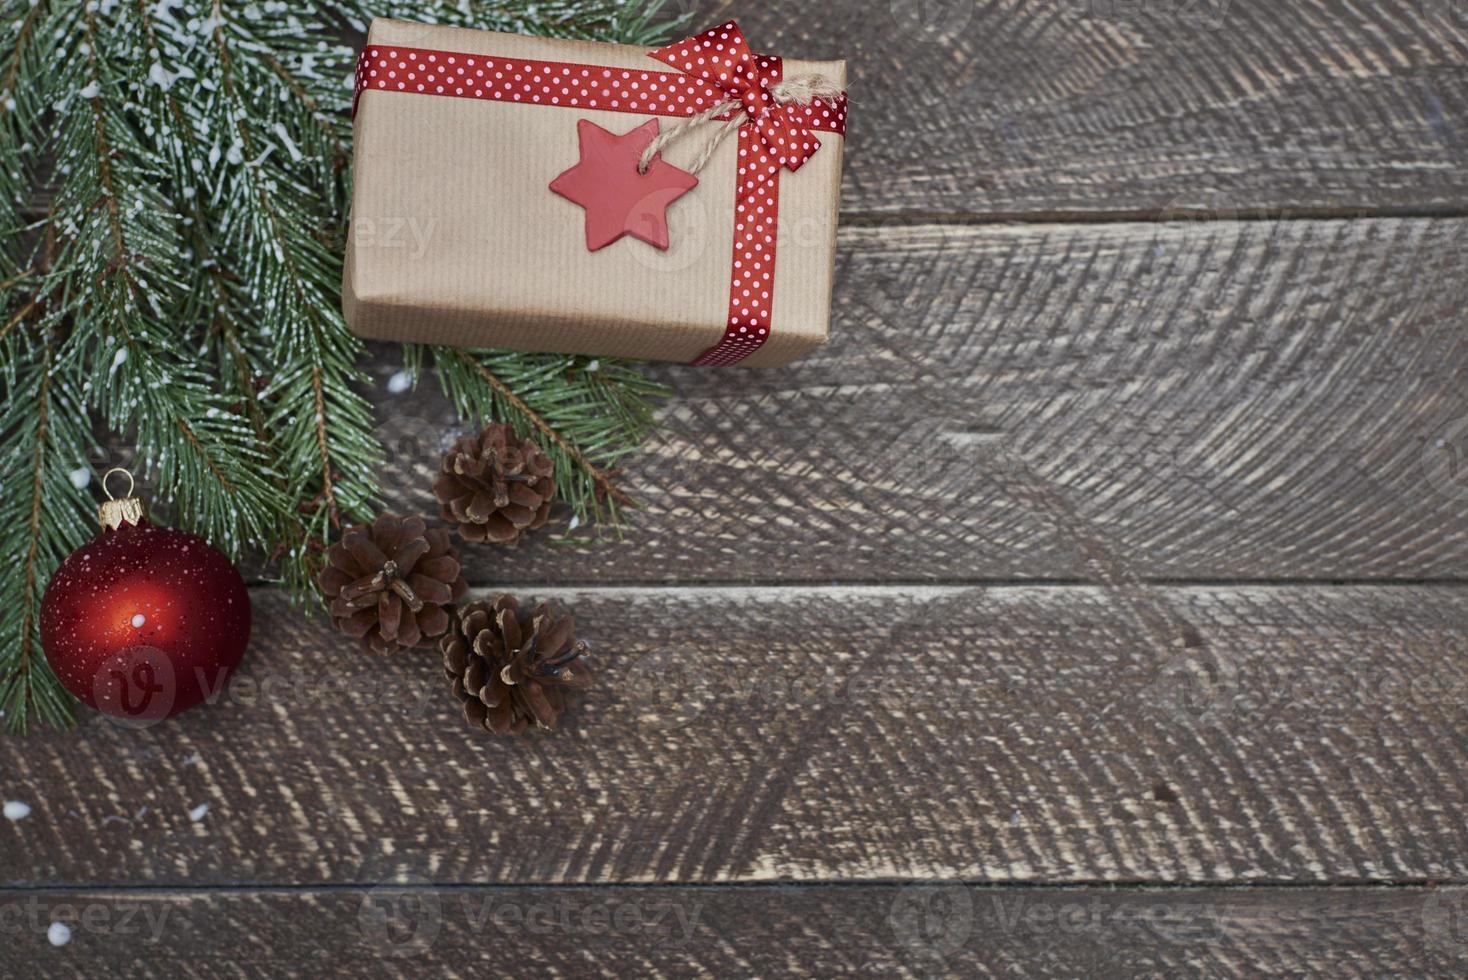 presente de natal na temporada de inverno foto